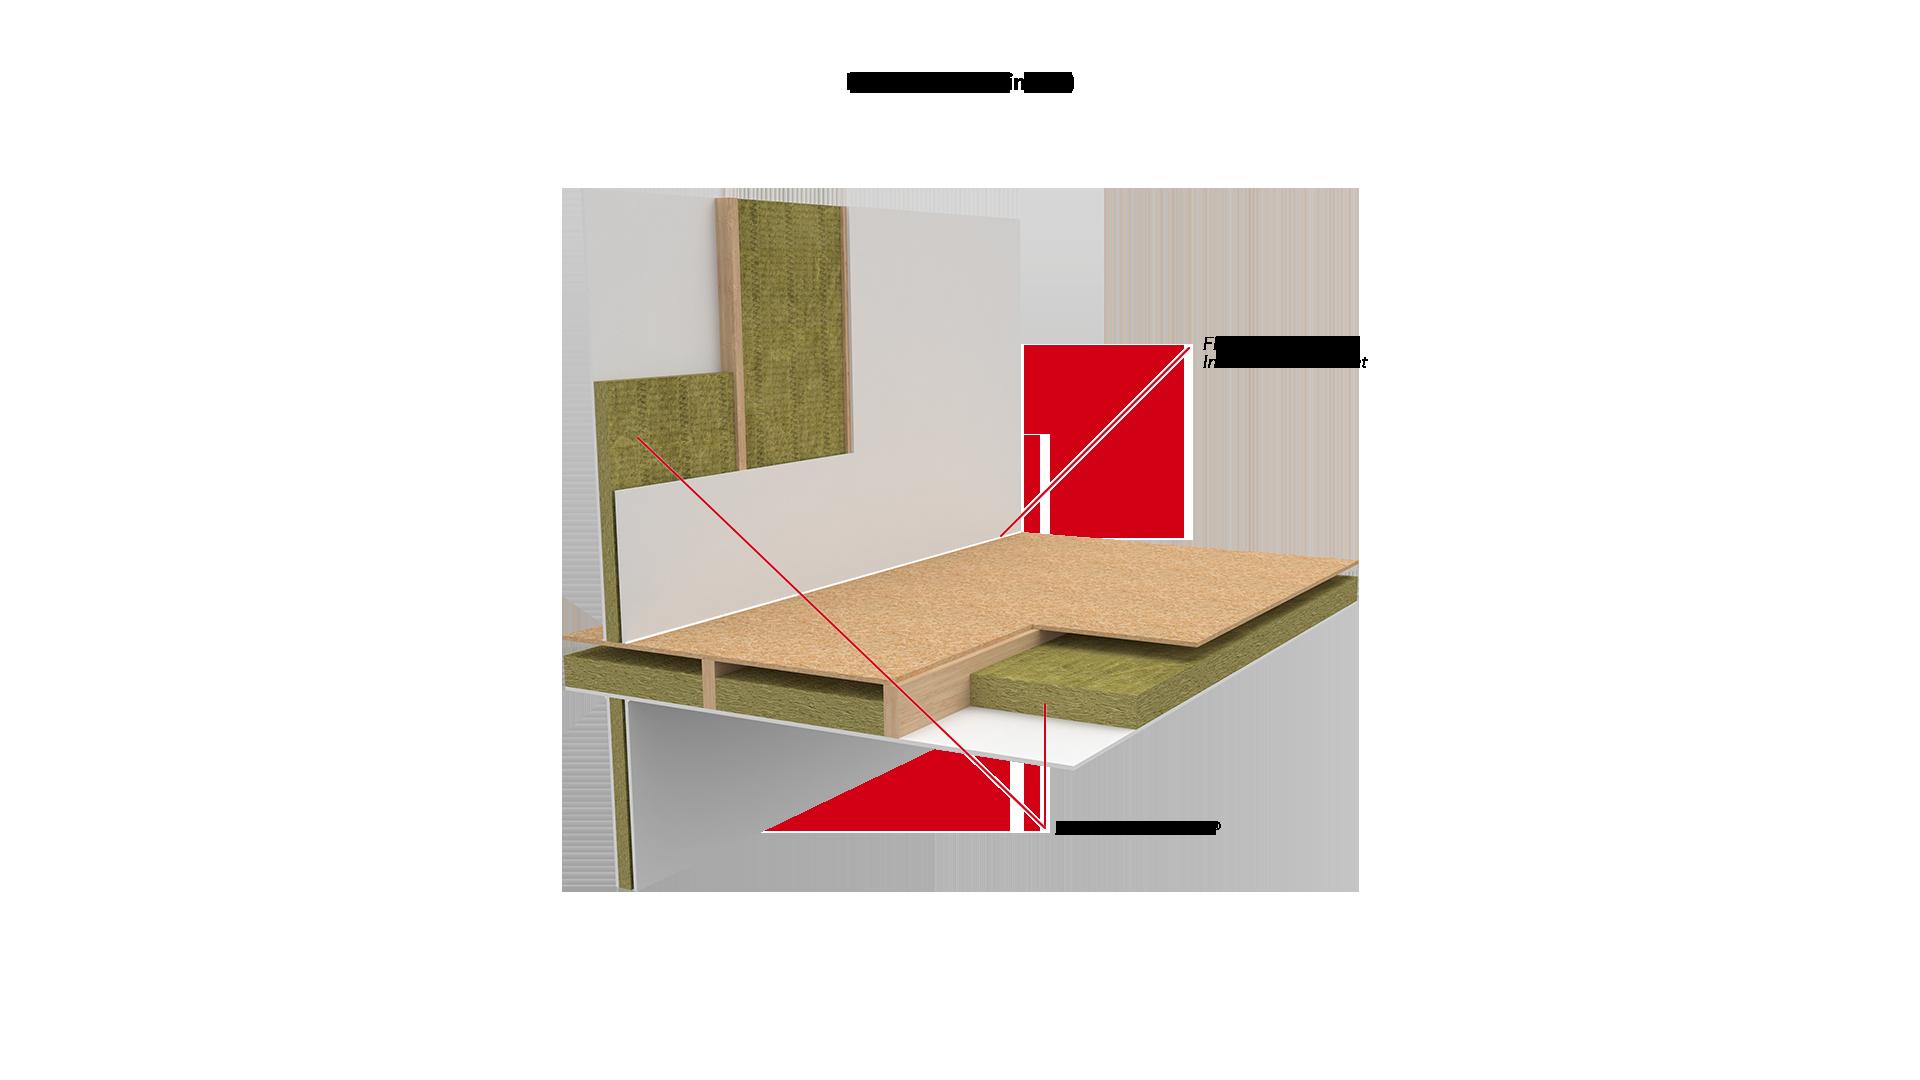 Internal Floor - Timber - FLEXI, Acoustic Intumescent Sealant